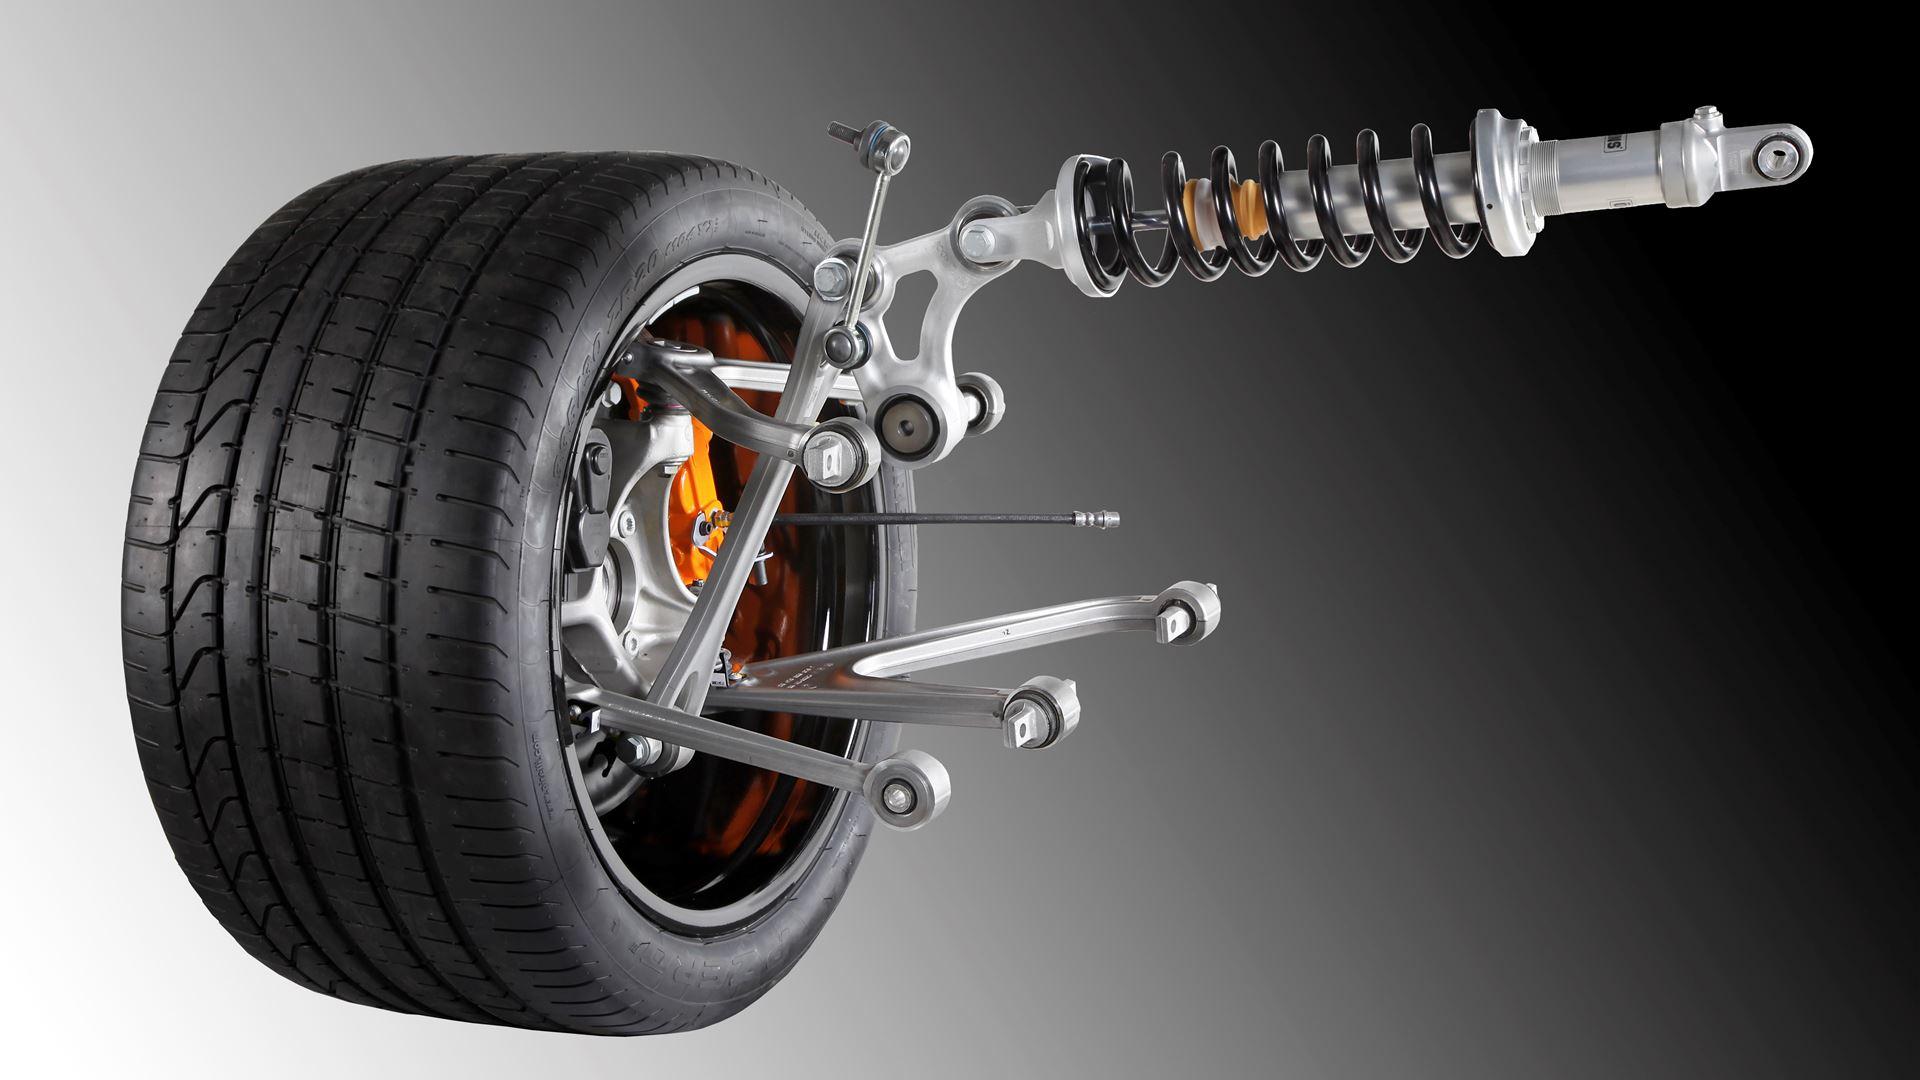 Lamborghini Aventador: 10 innovations in 10 years - Image 5